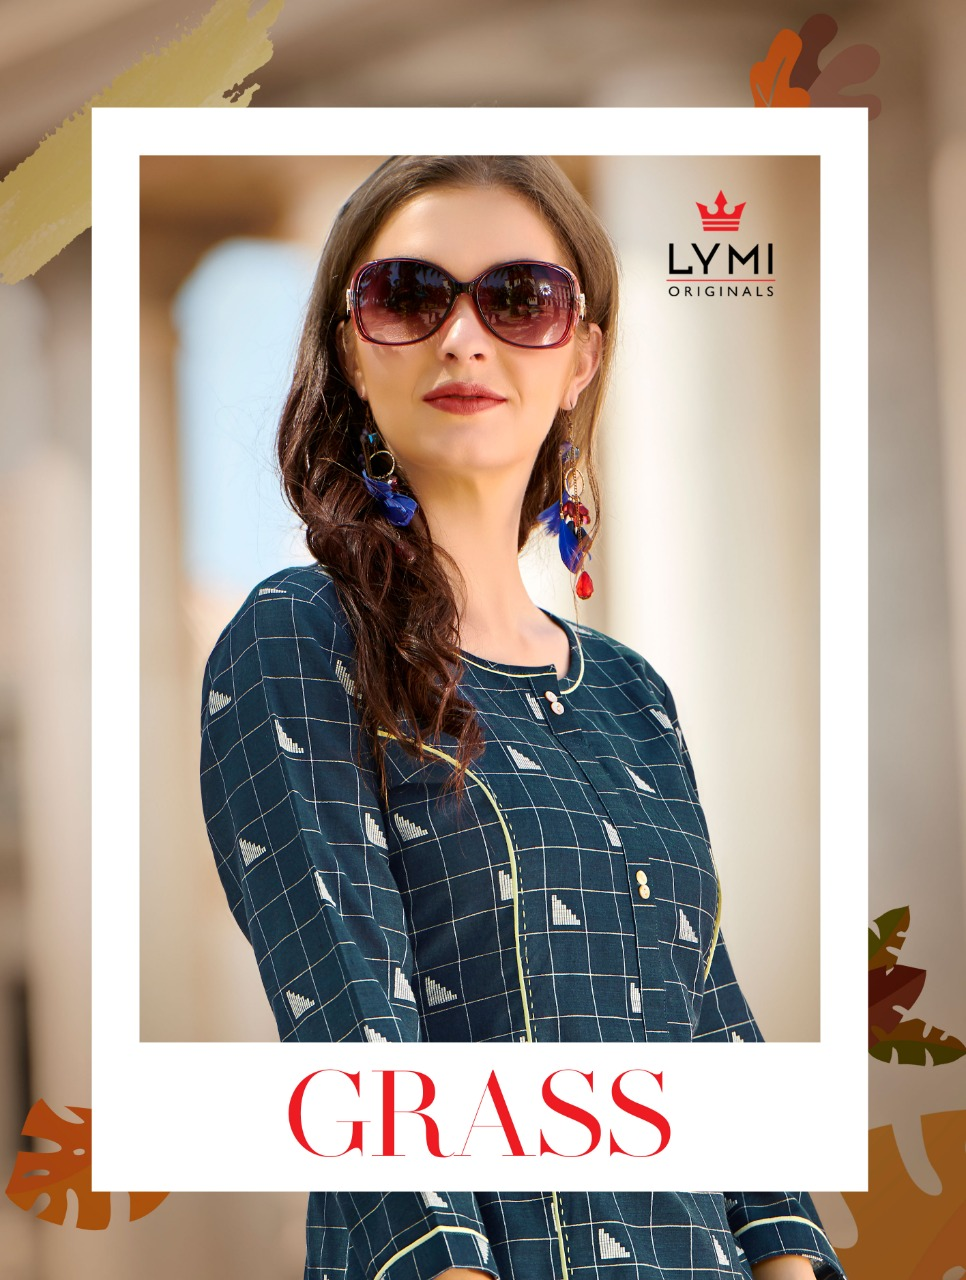 Kessi Lymi Grass Cotton Weaving Designer Daily Wear Kurtis Wholesale